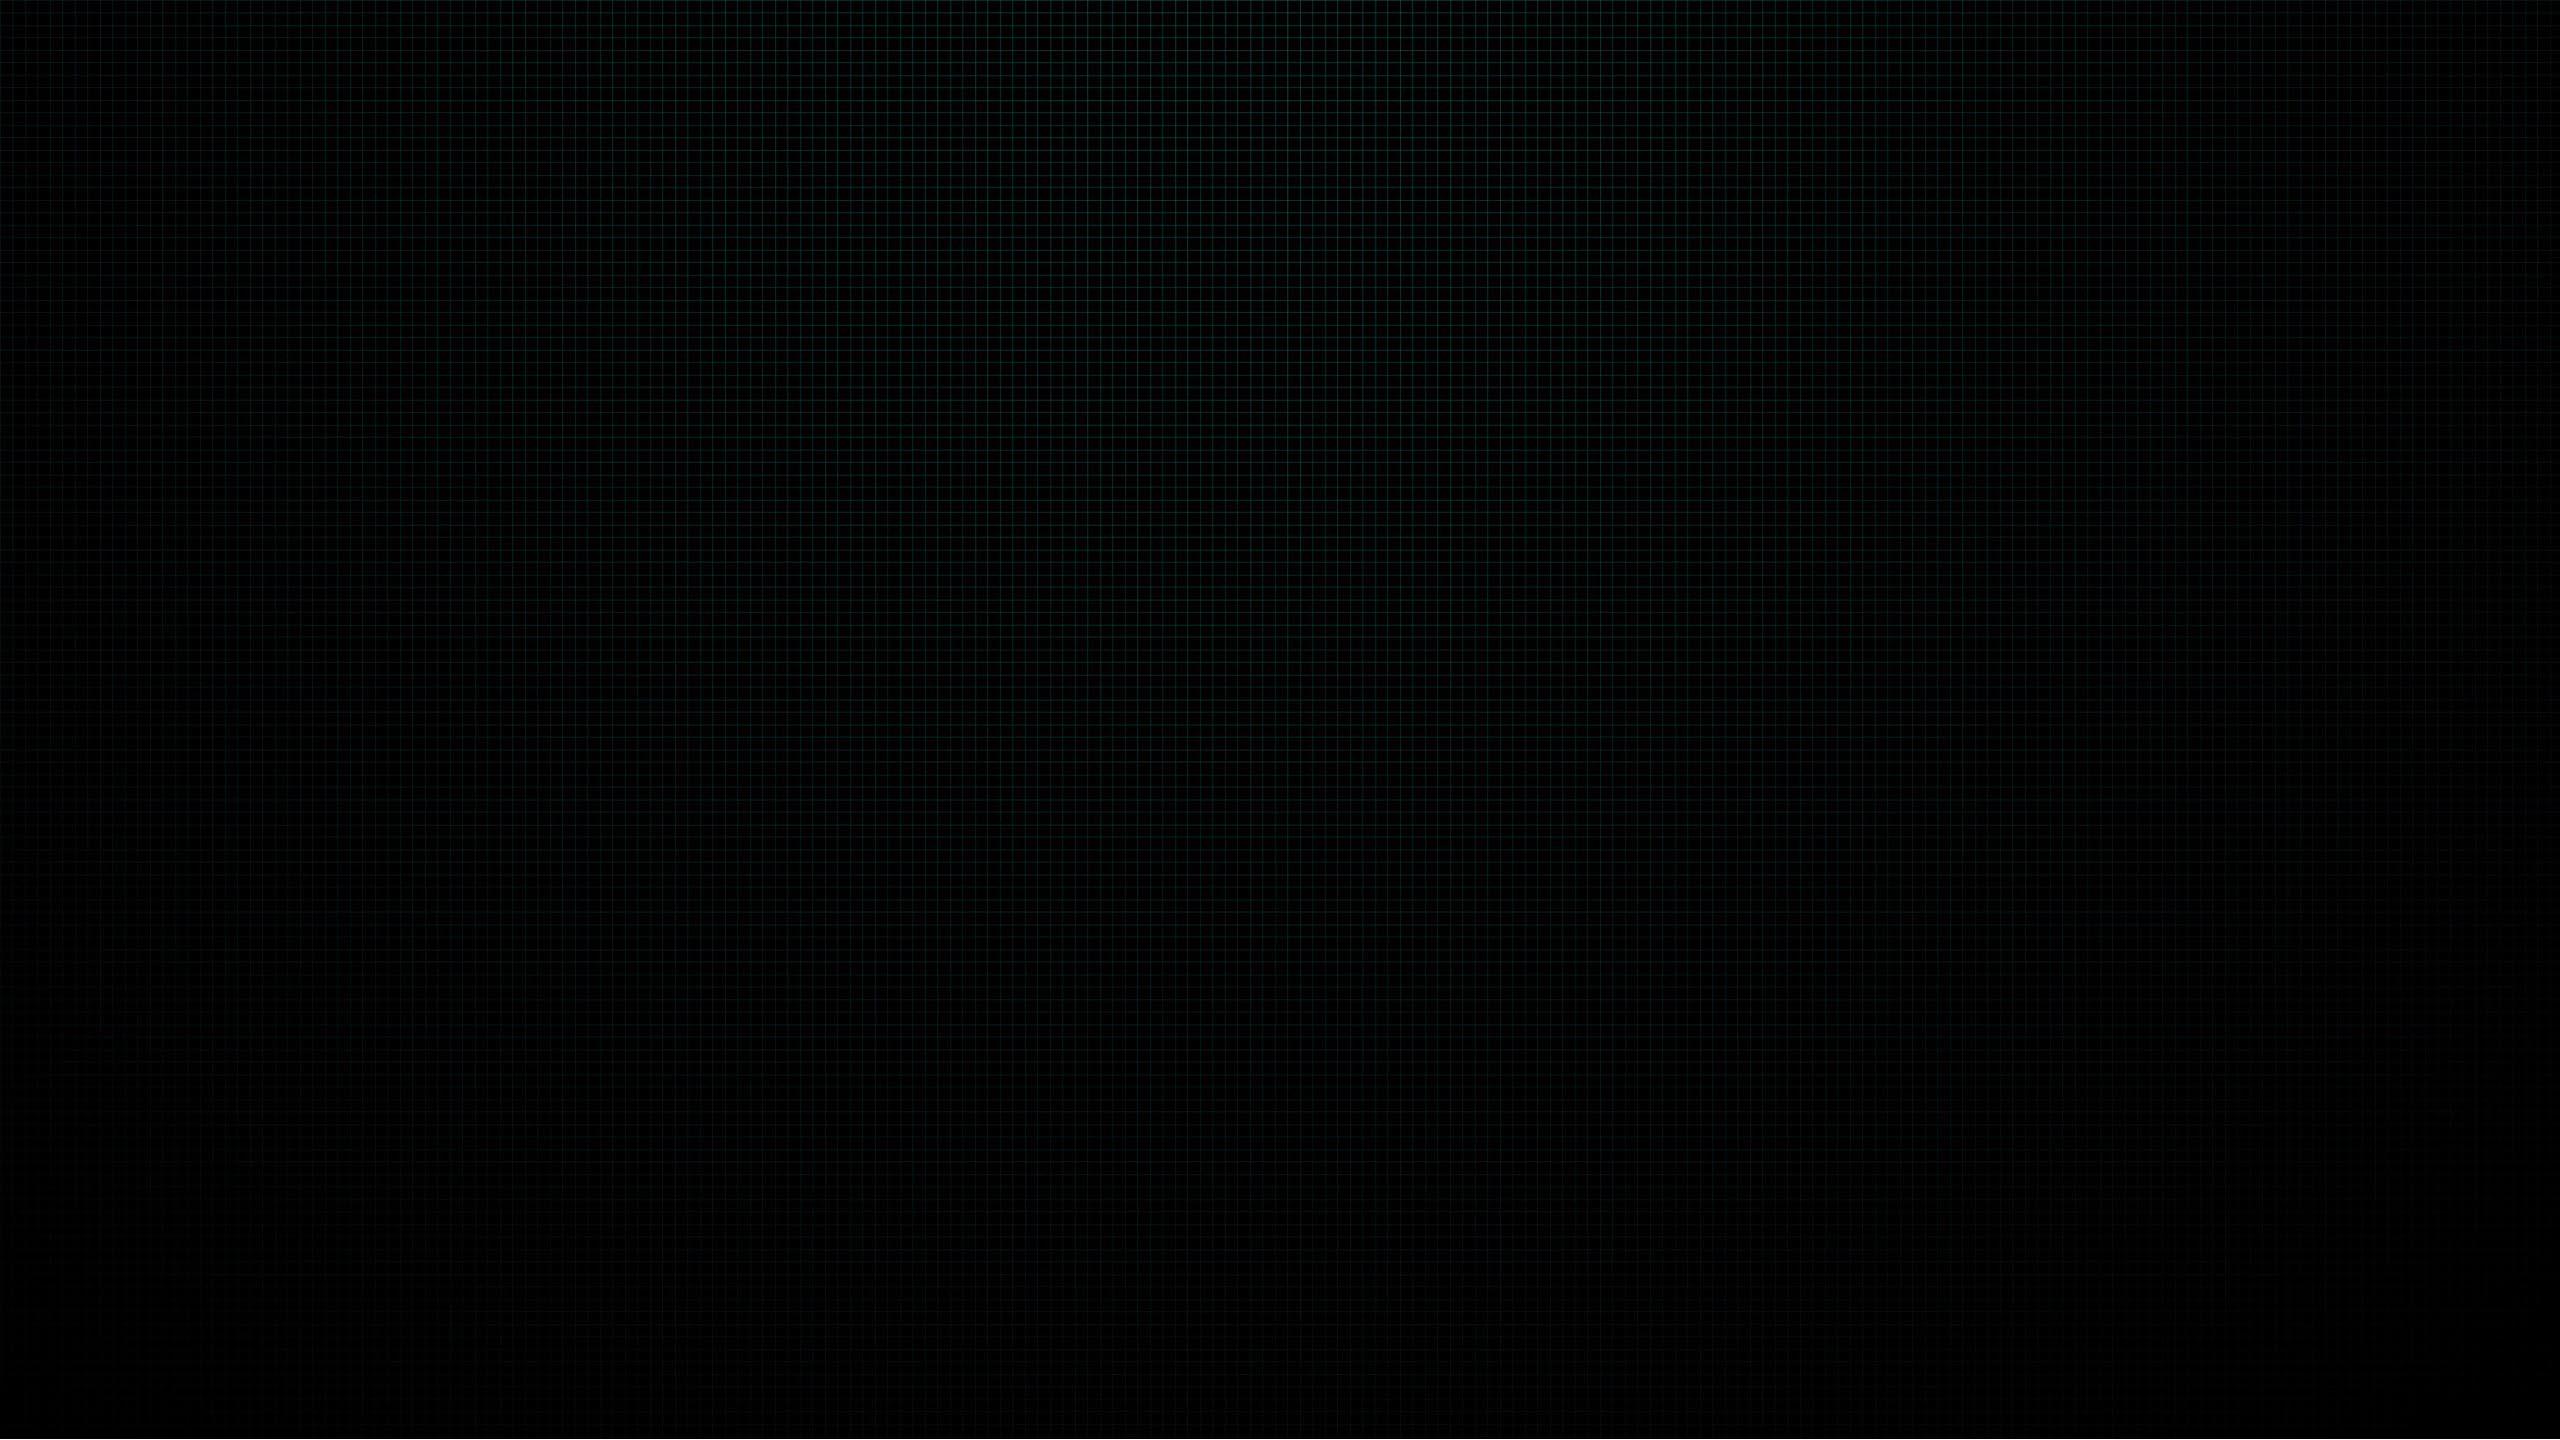 pc full screen wallpaper free